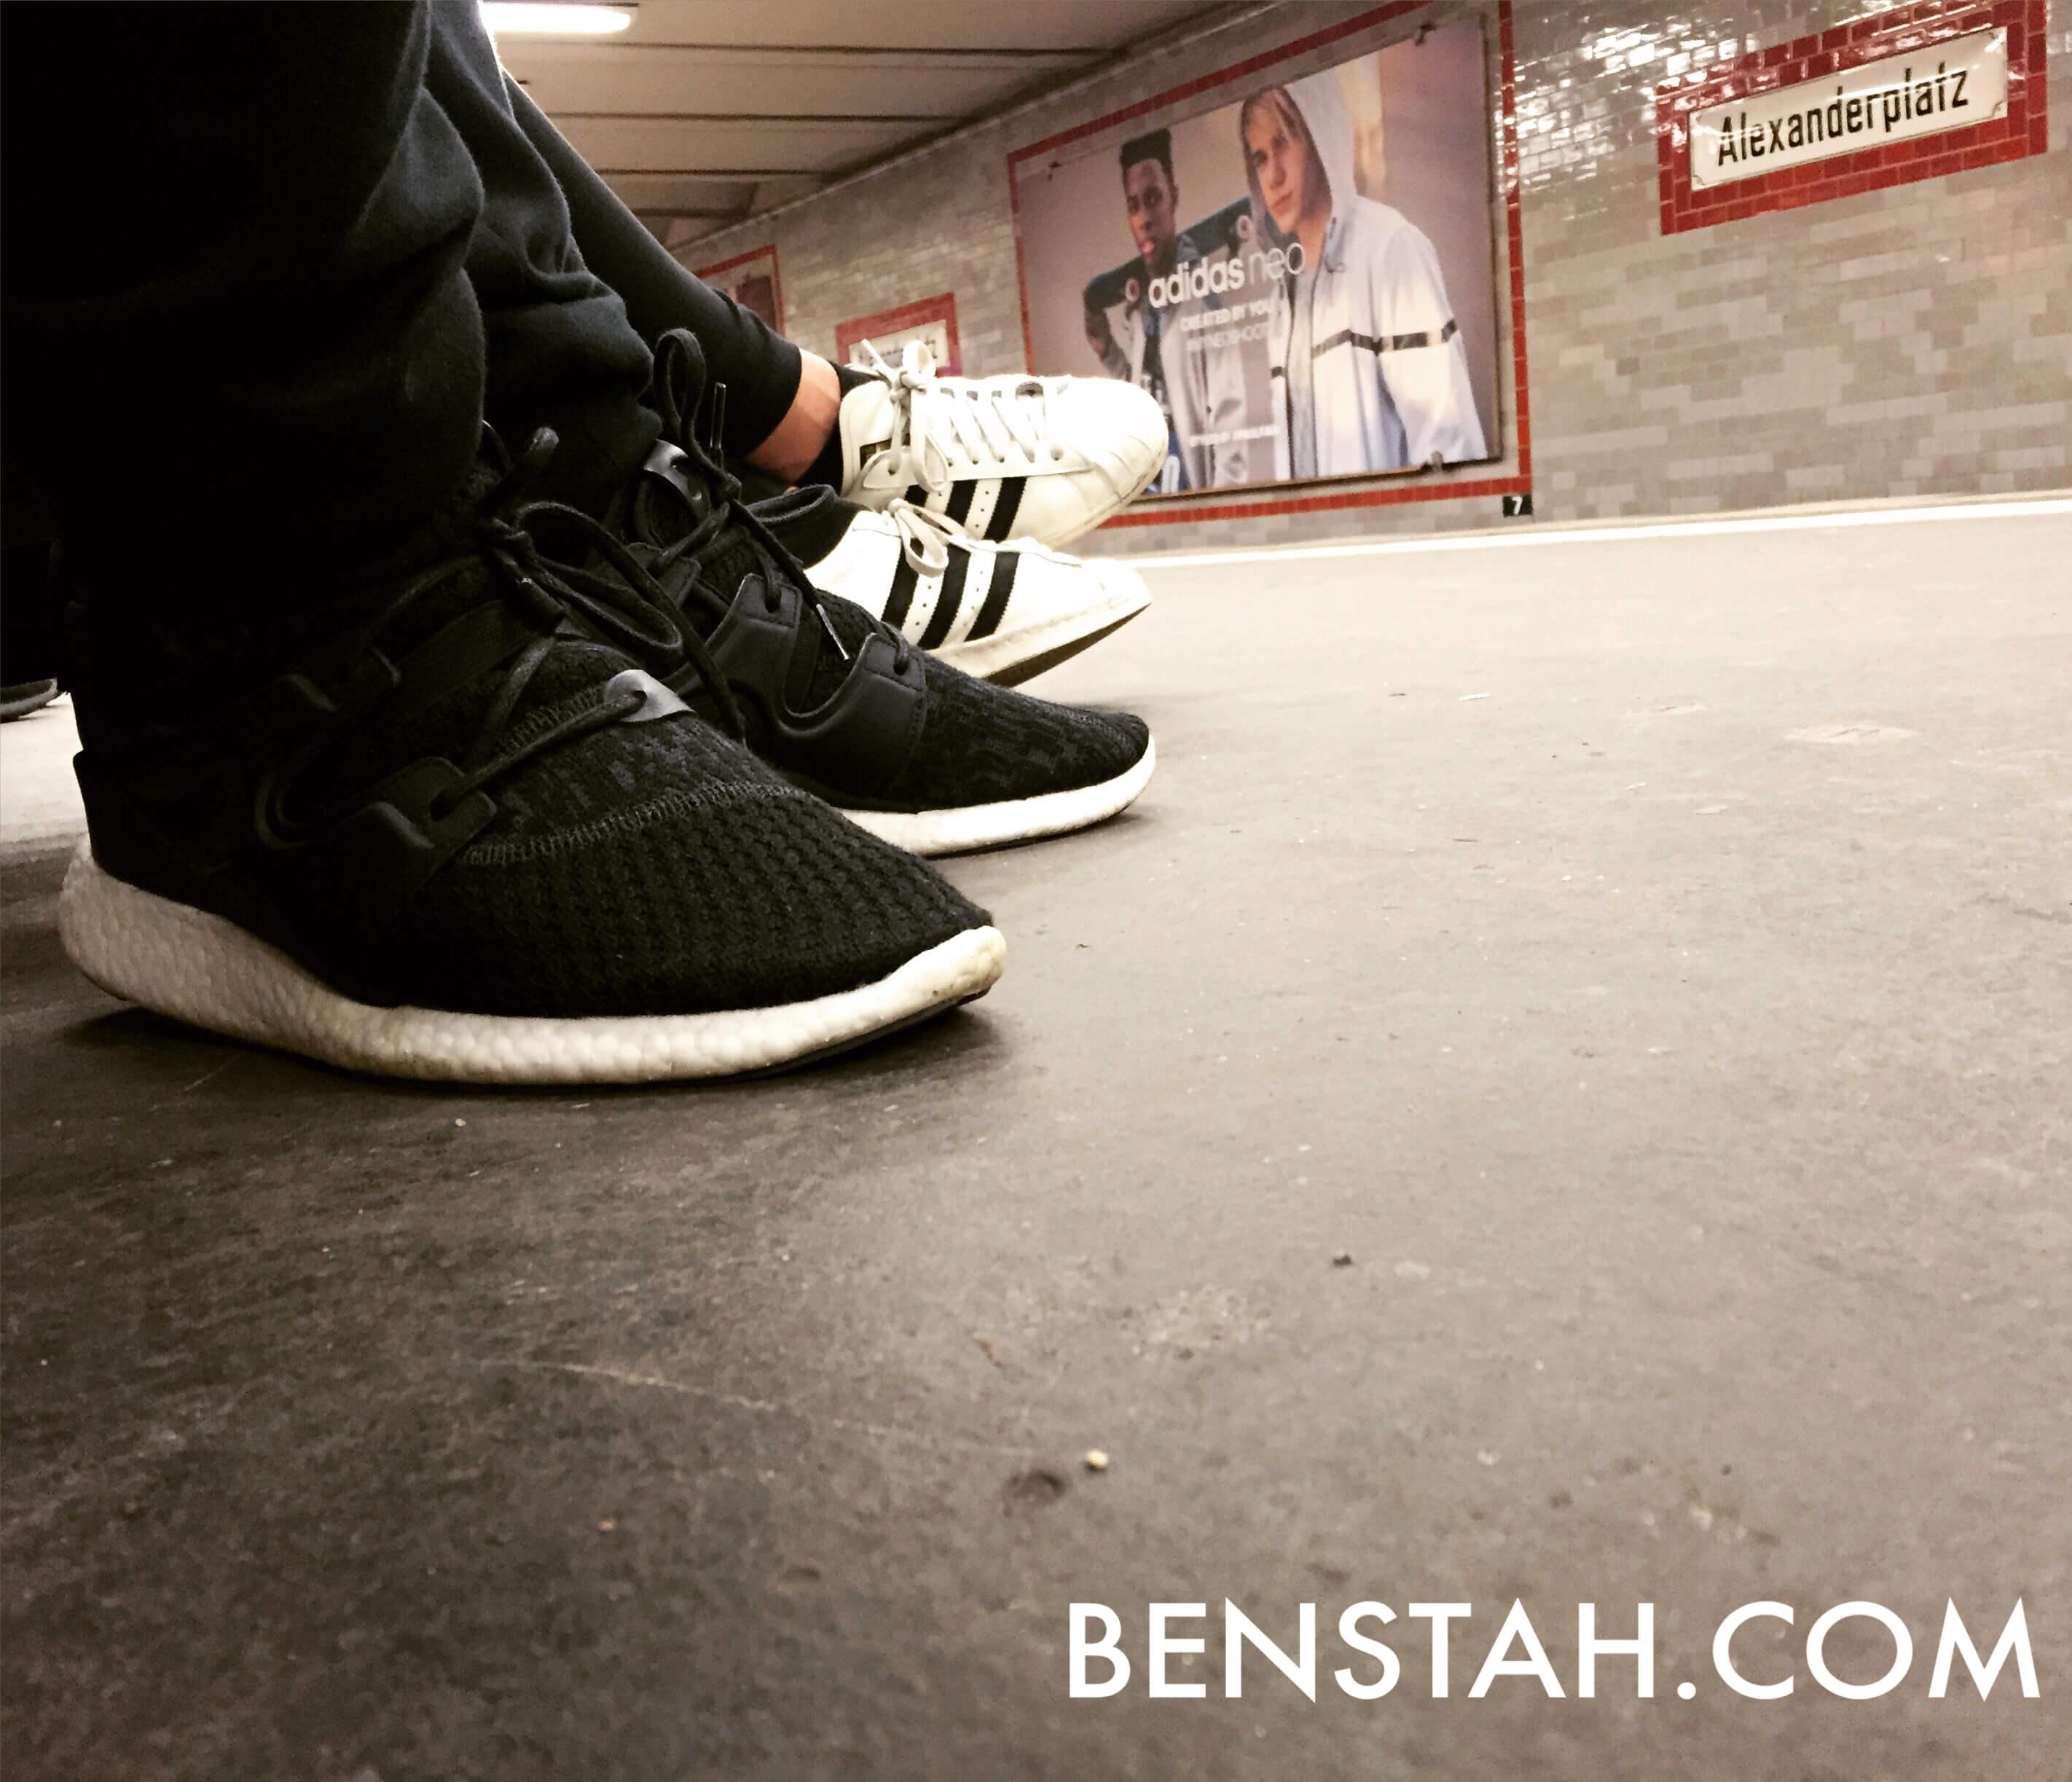 Adidas-EQT-F15-Action-View-Benstah-Onfeet